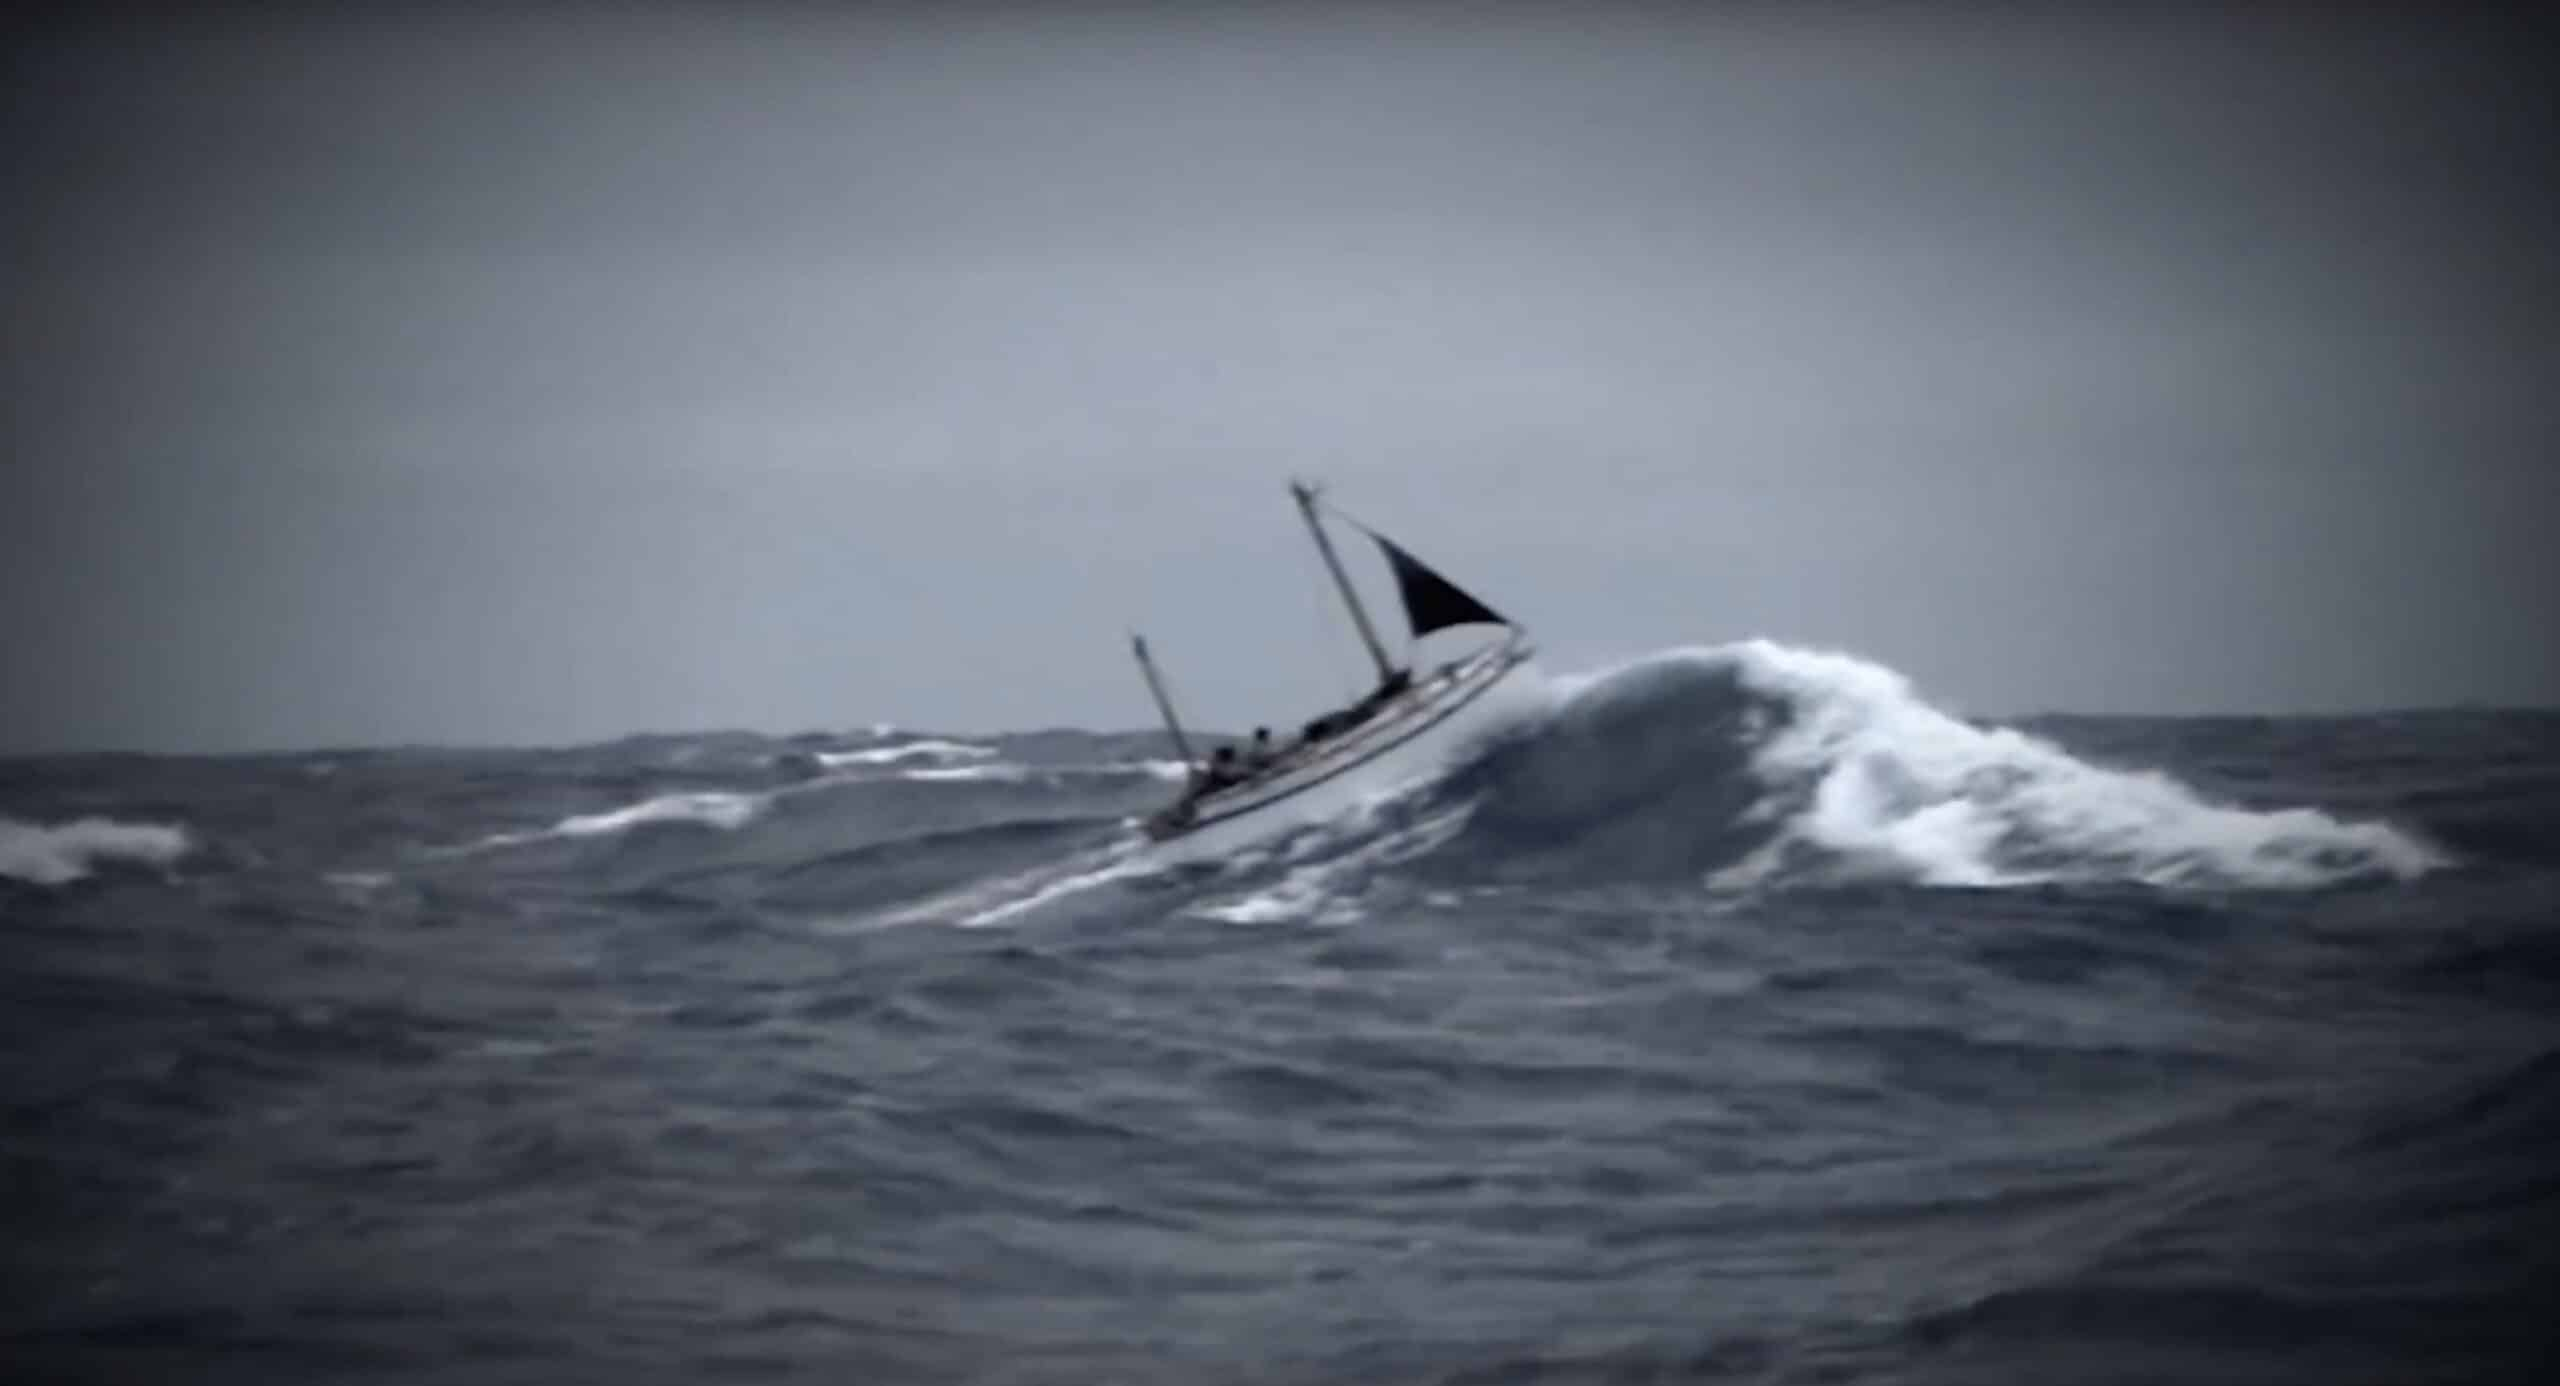 Shackleton 1